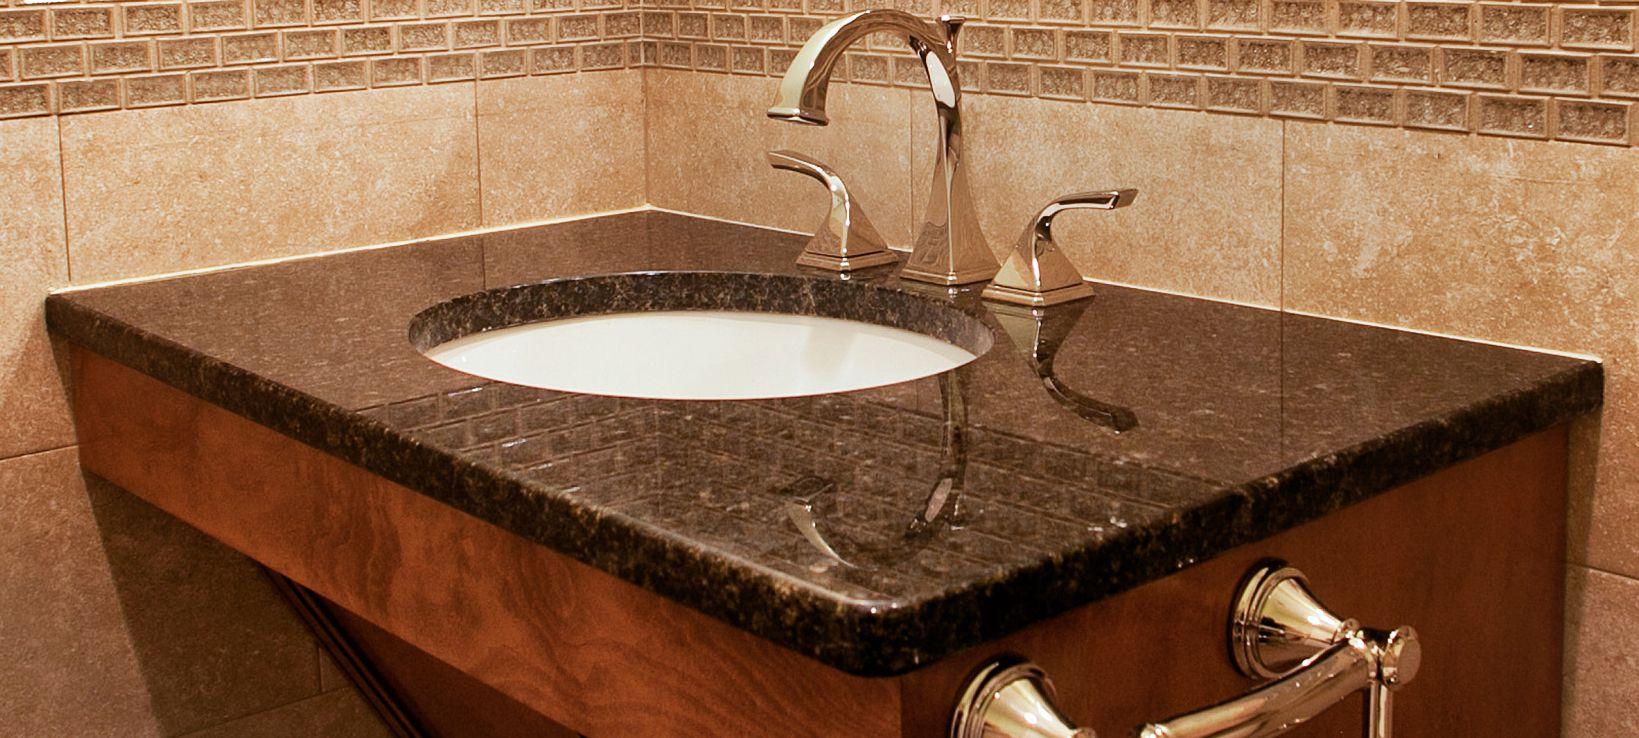 UBA Tuba granite counter top with under-mount, single-bowl ...